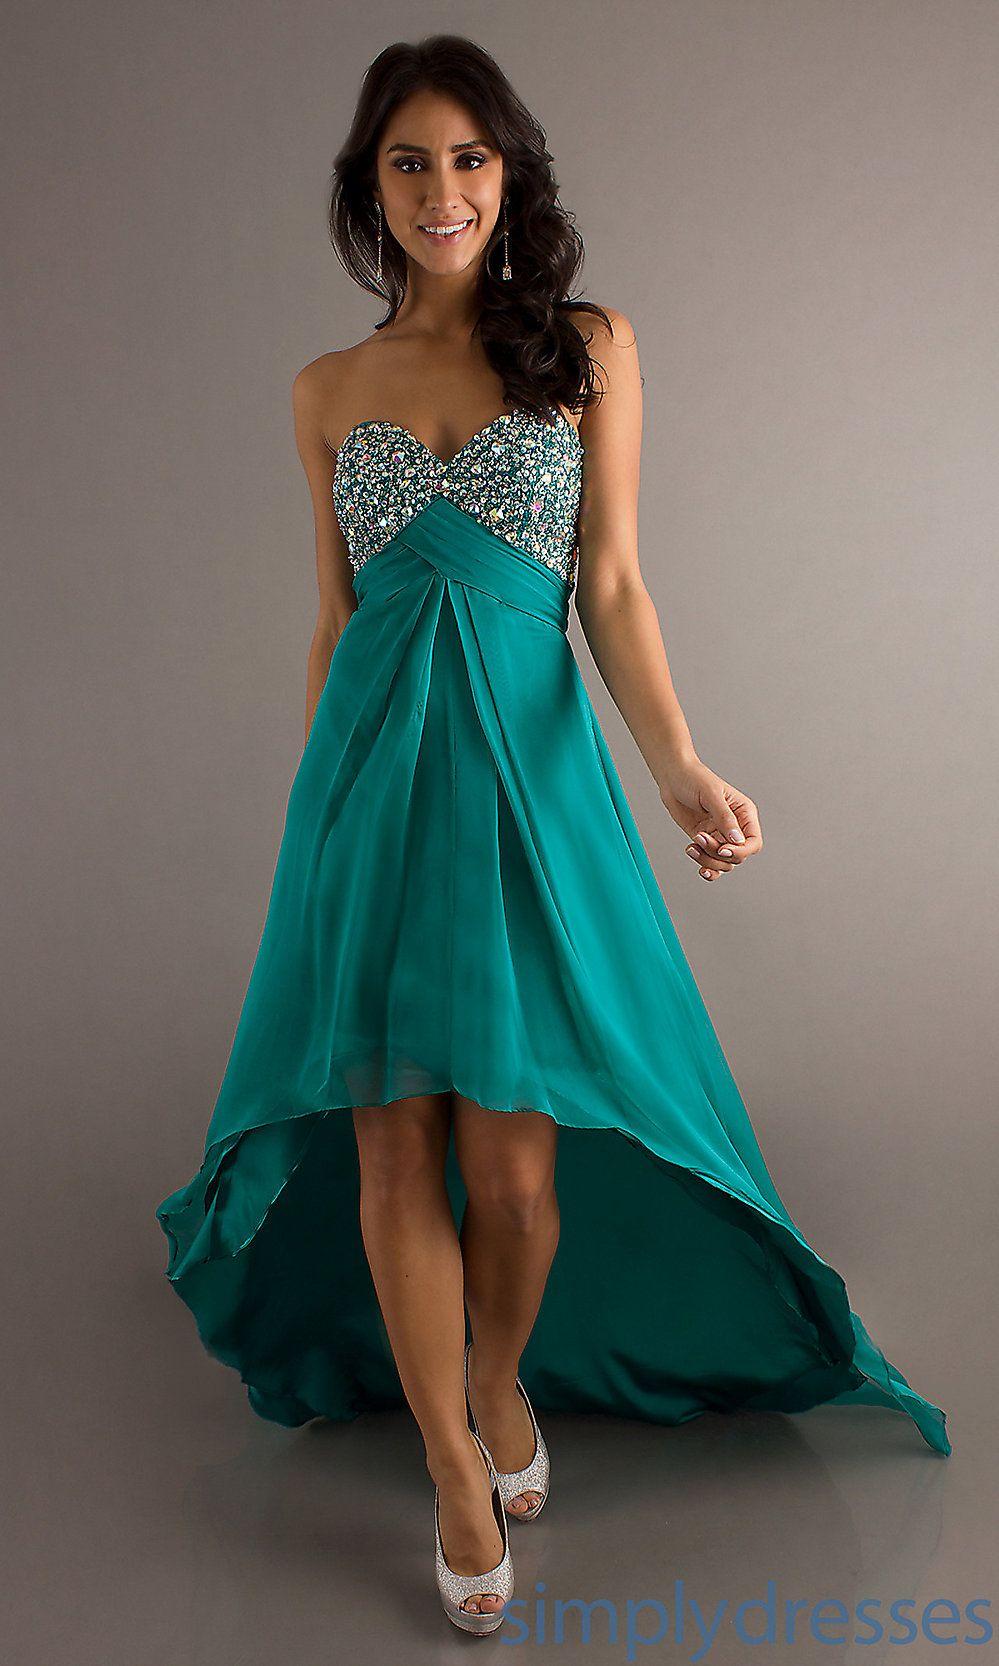 short teal blue bridesmaid dress | Dresses Holiday Dresses Club ...